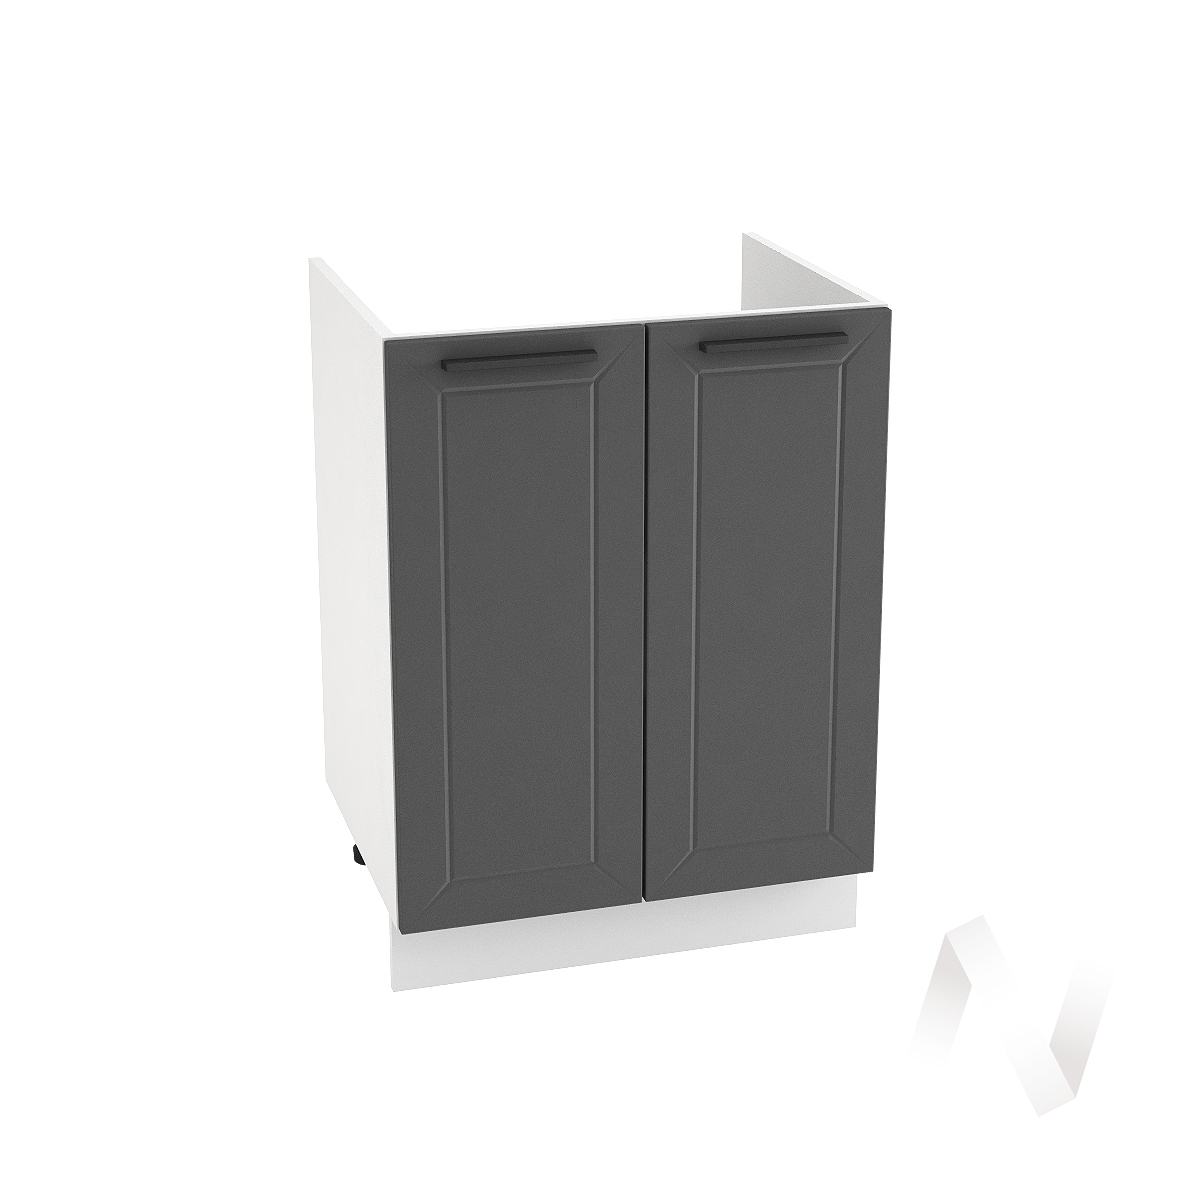 "Кухня ""Глетчер"": Шкаф нижний под мойку 600, ШНМ 600 (Маренго силк/корпус белый)"